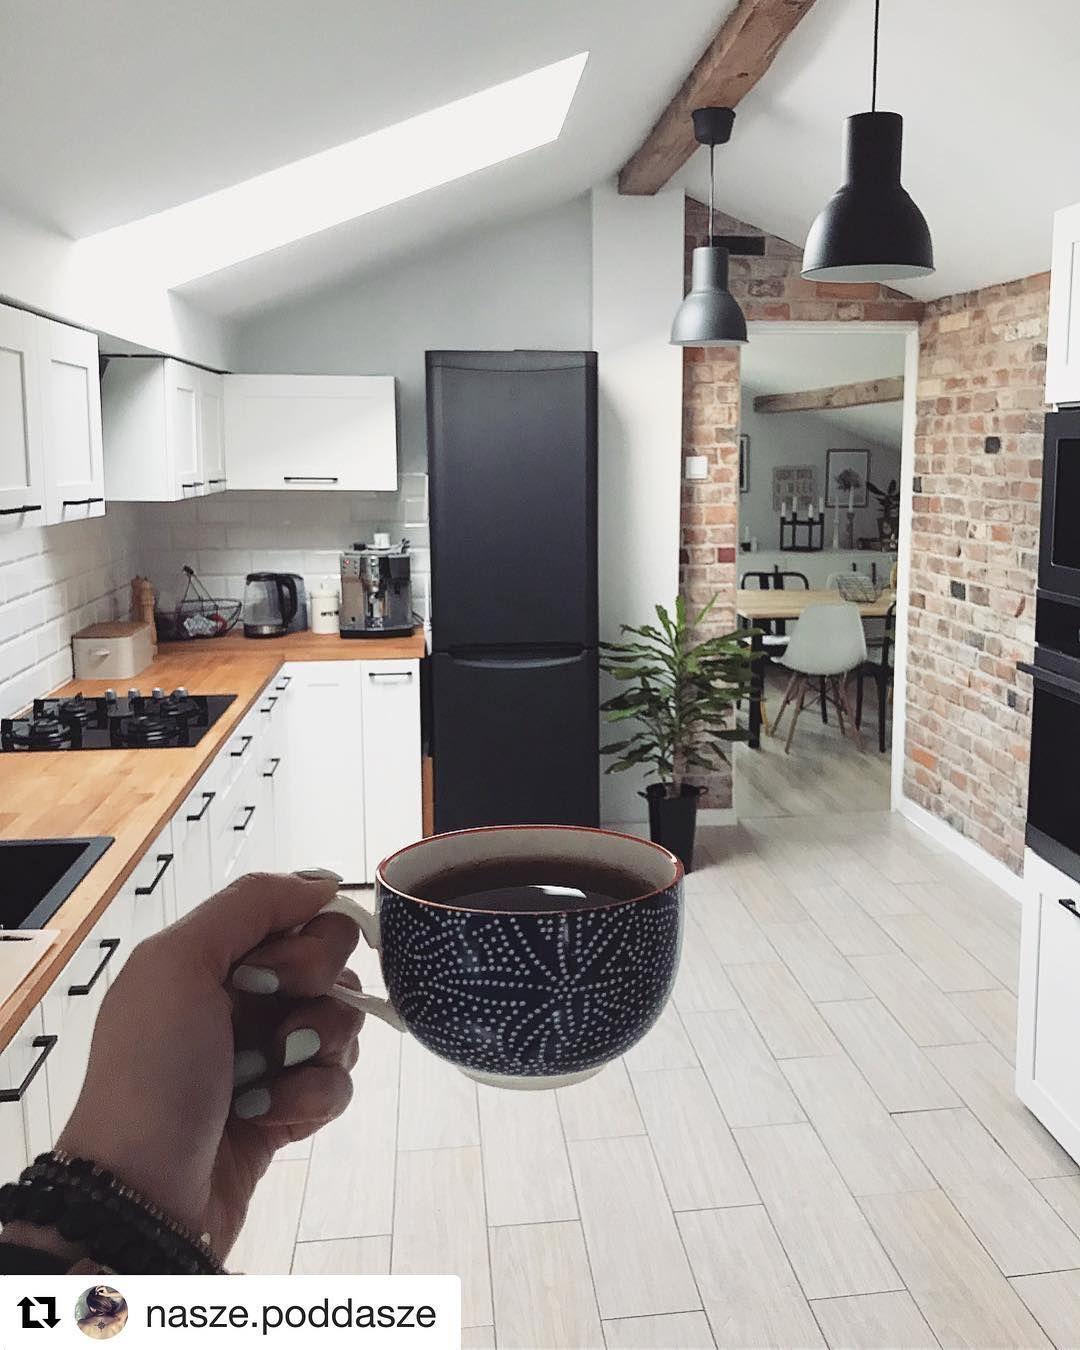 Troche Sie Pozmienialo W Kuchni Nasze Poddasze Homebook Kitchen Kitchendesign Interiordesign Interior Inte Rustik Mutfak Mutfak Yenileme Mutfak